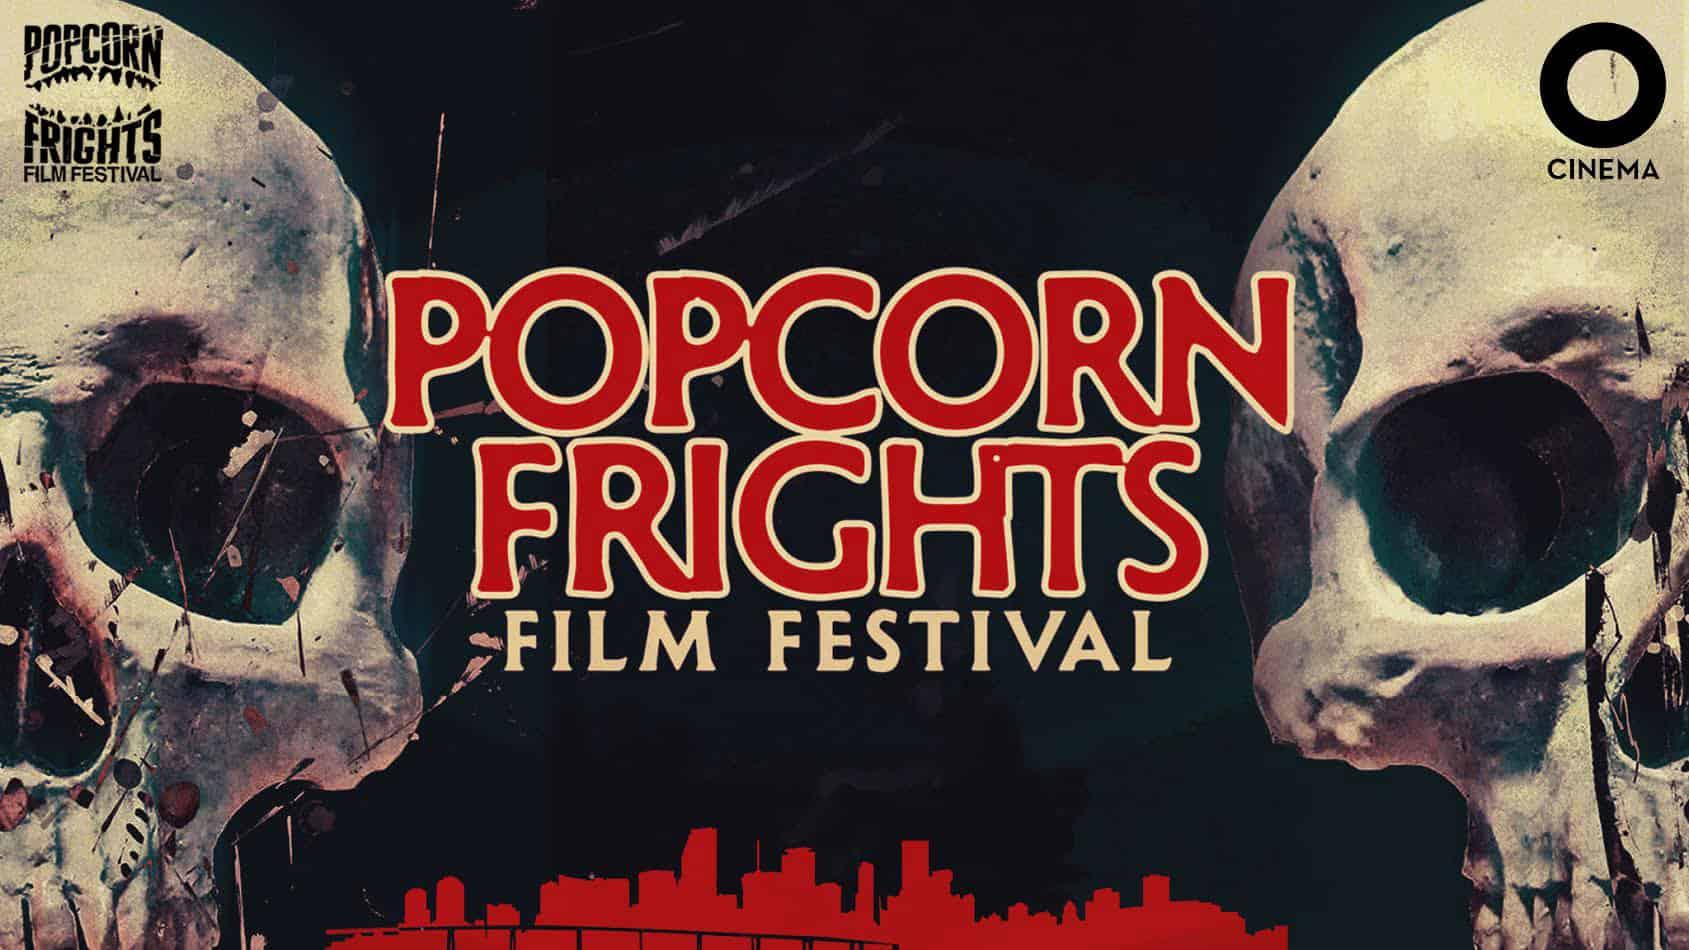 Horror Movie News:  Popcorn Frights Film Festival August 10-16